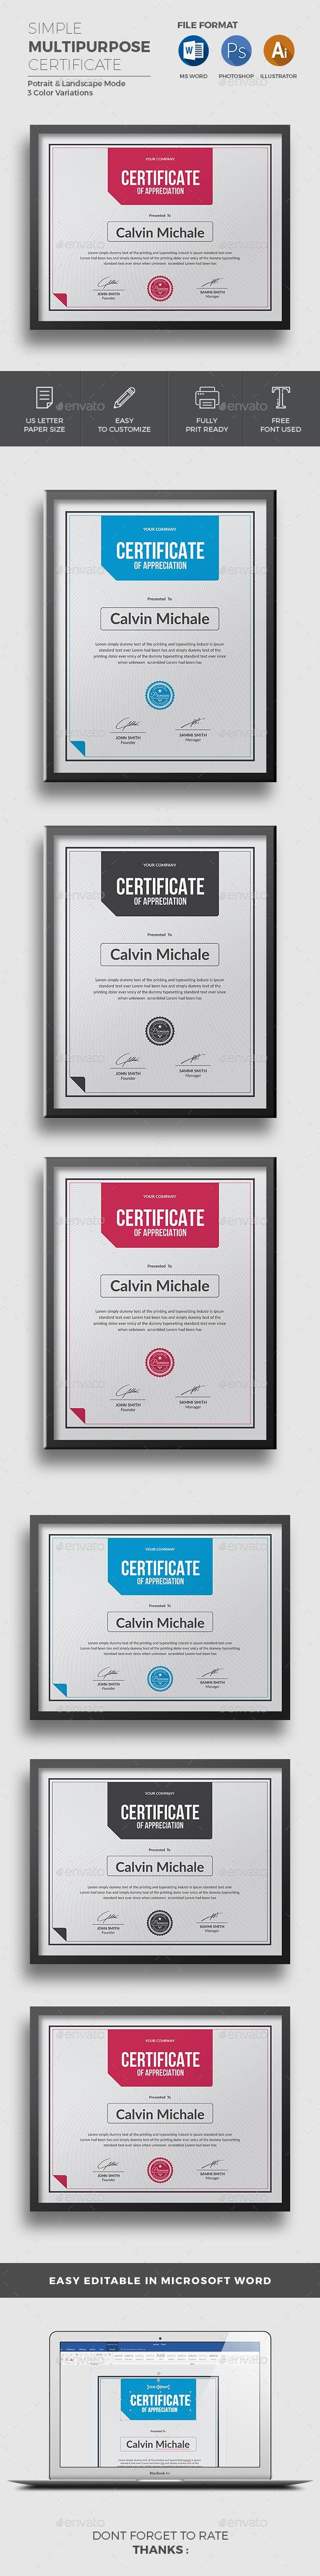 Certificate Templates  Modern Certificate Template PSD, #design Download: https://graphicriver.net/item/certificate/18701876?ref=jpixel55